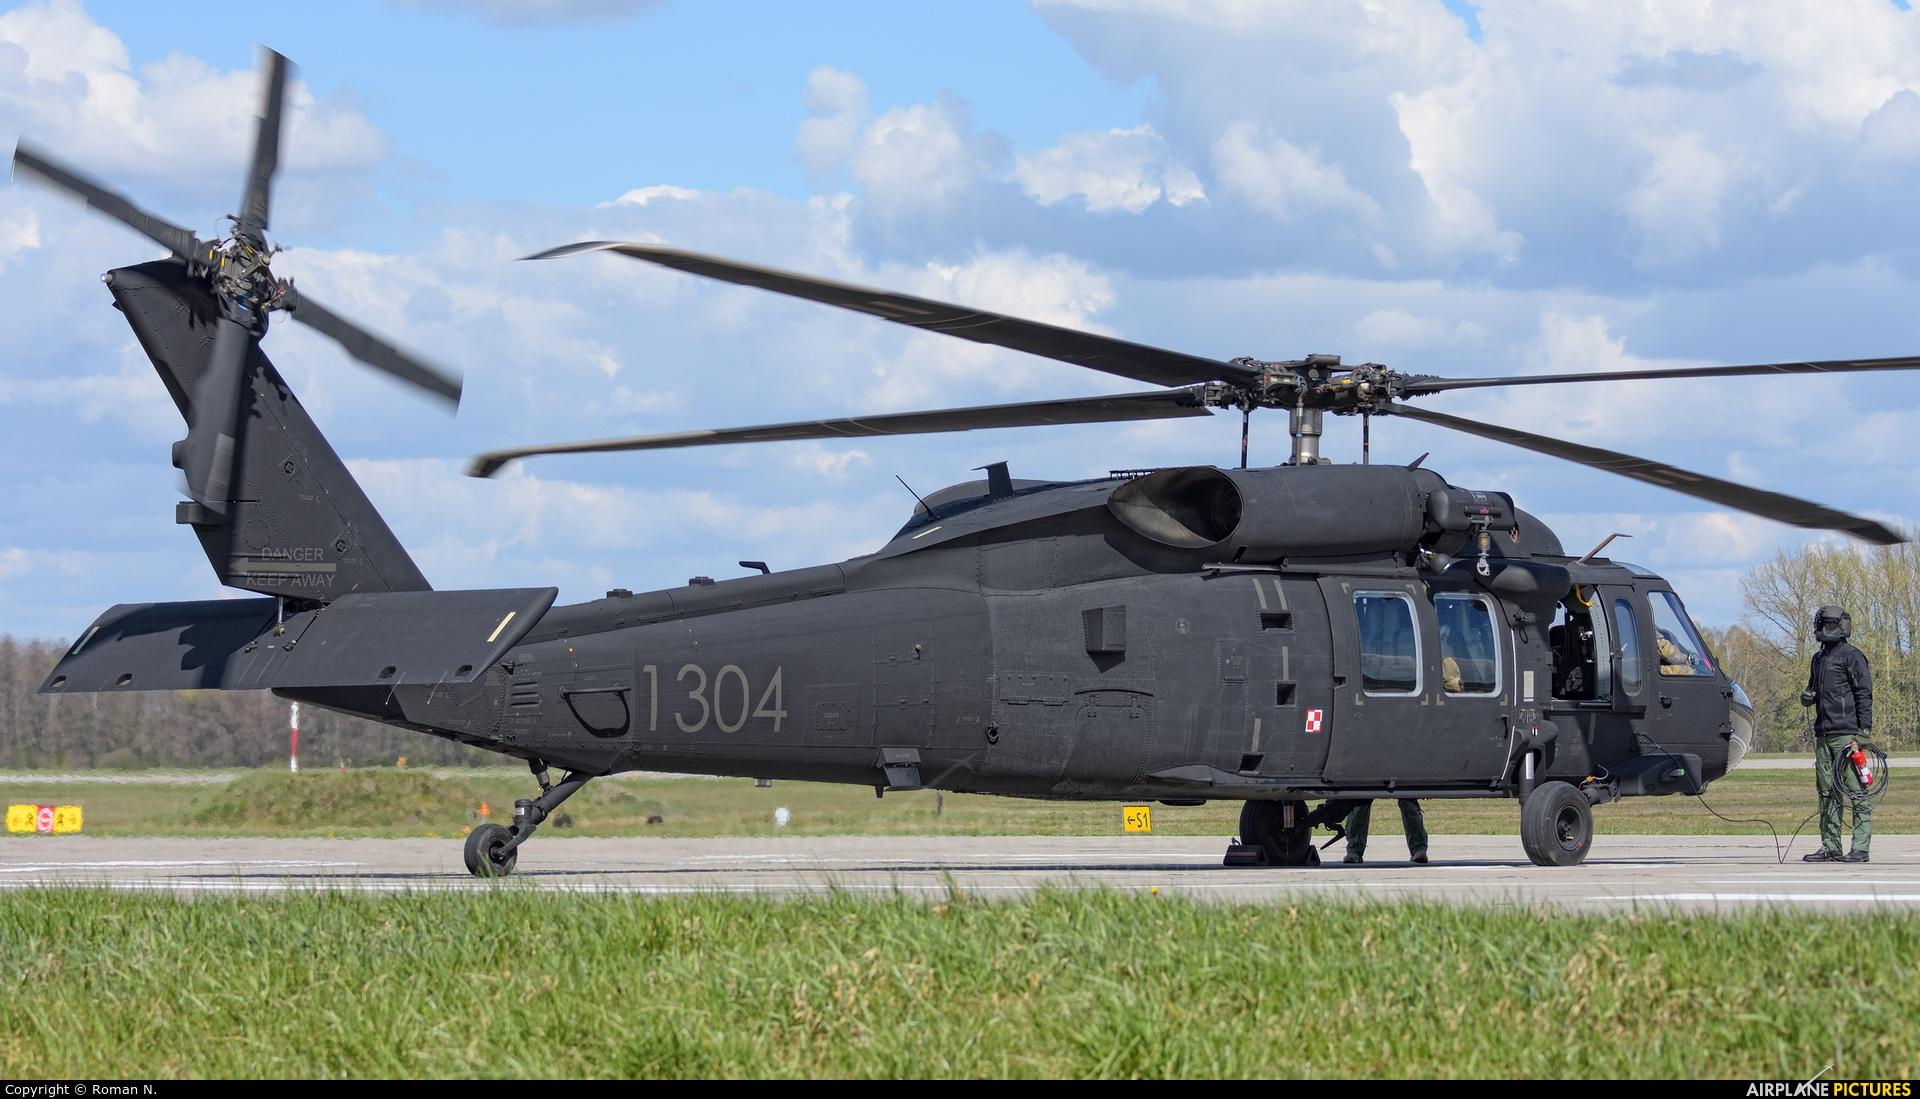 Poland - Air Force 1304 aircraft at Off Airport - Poland